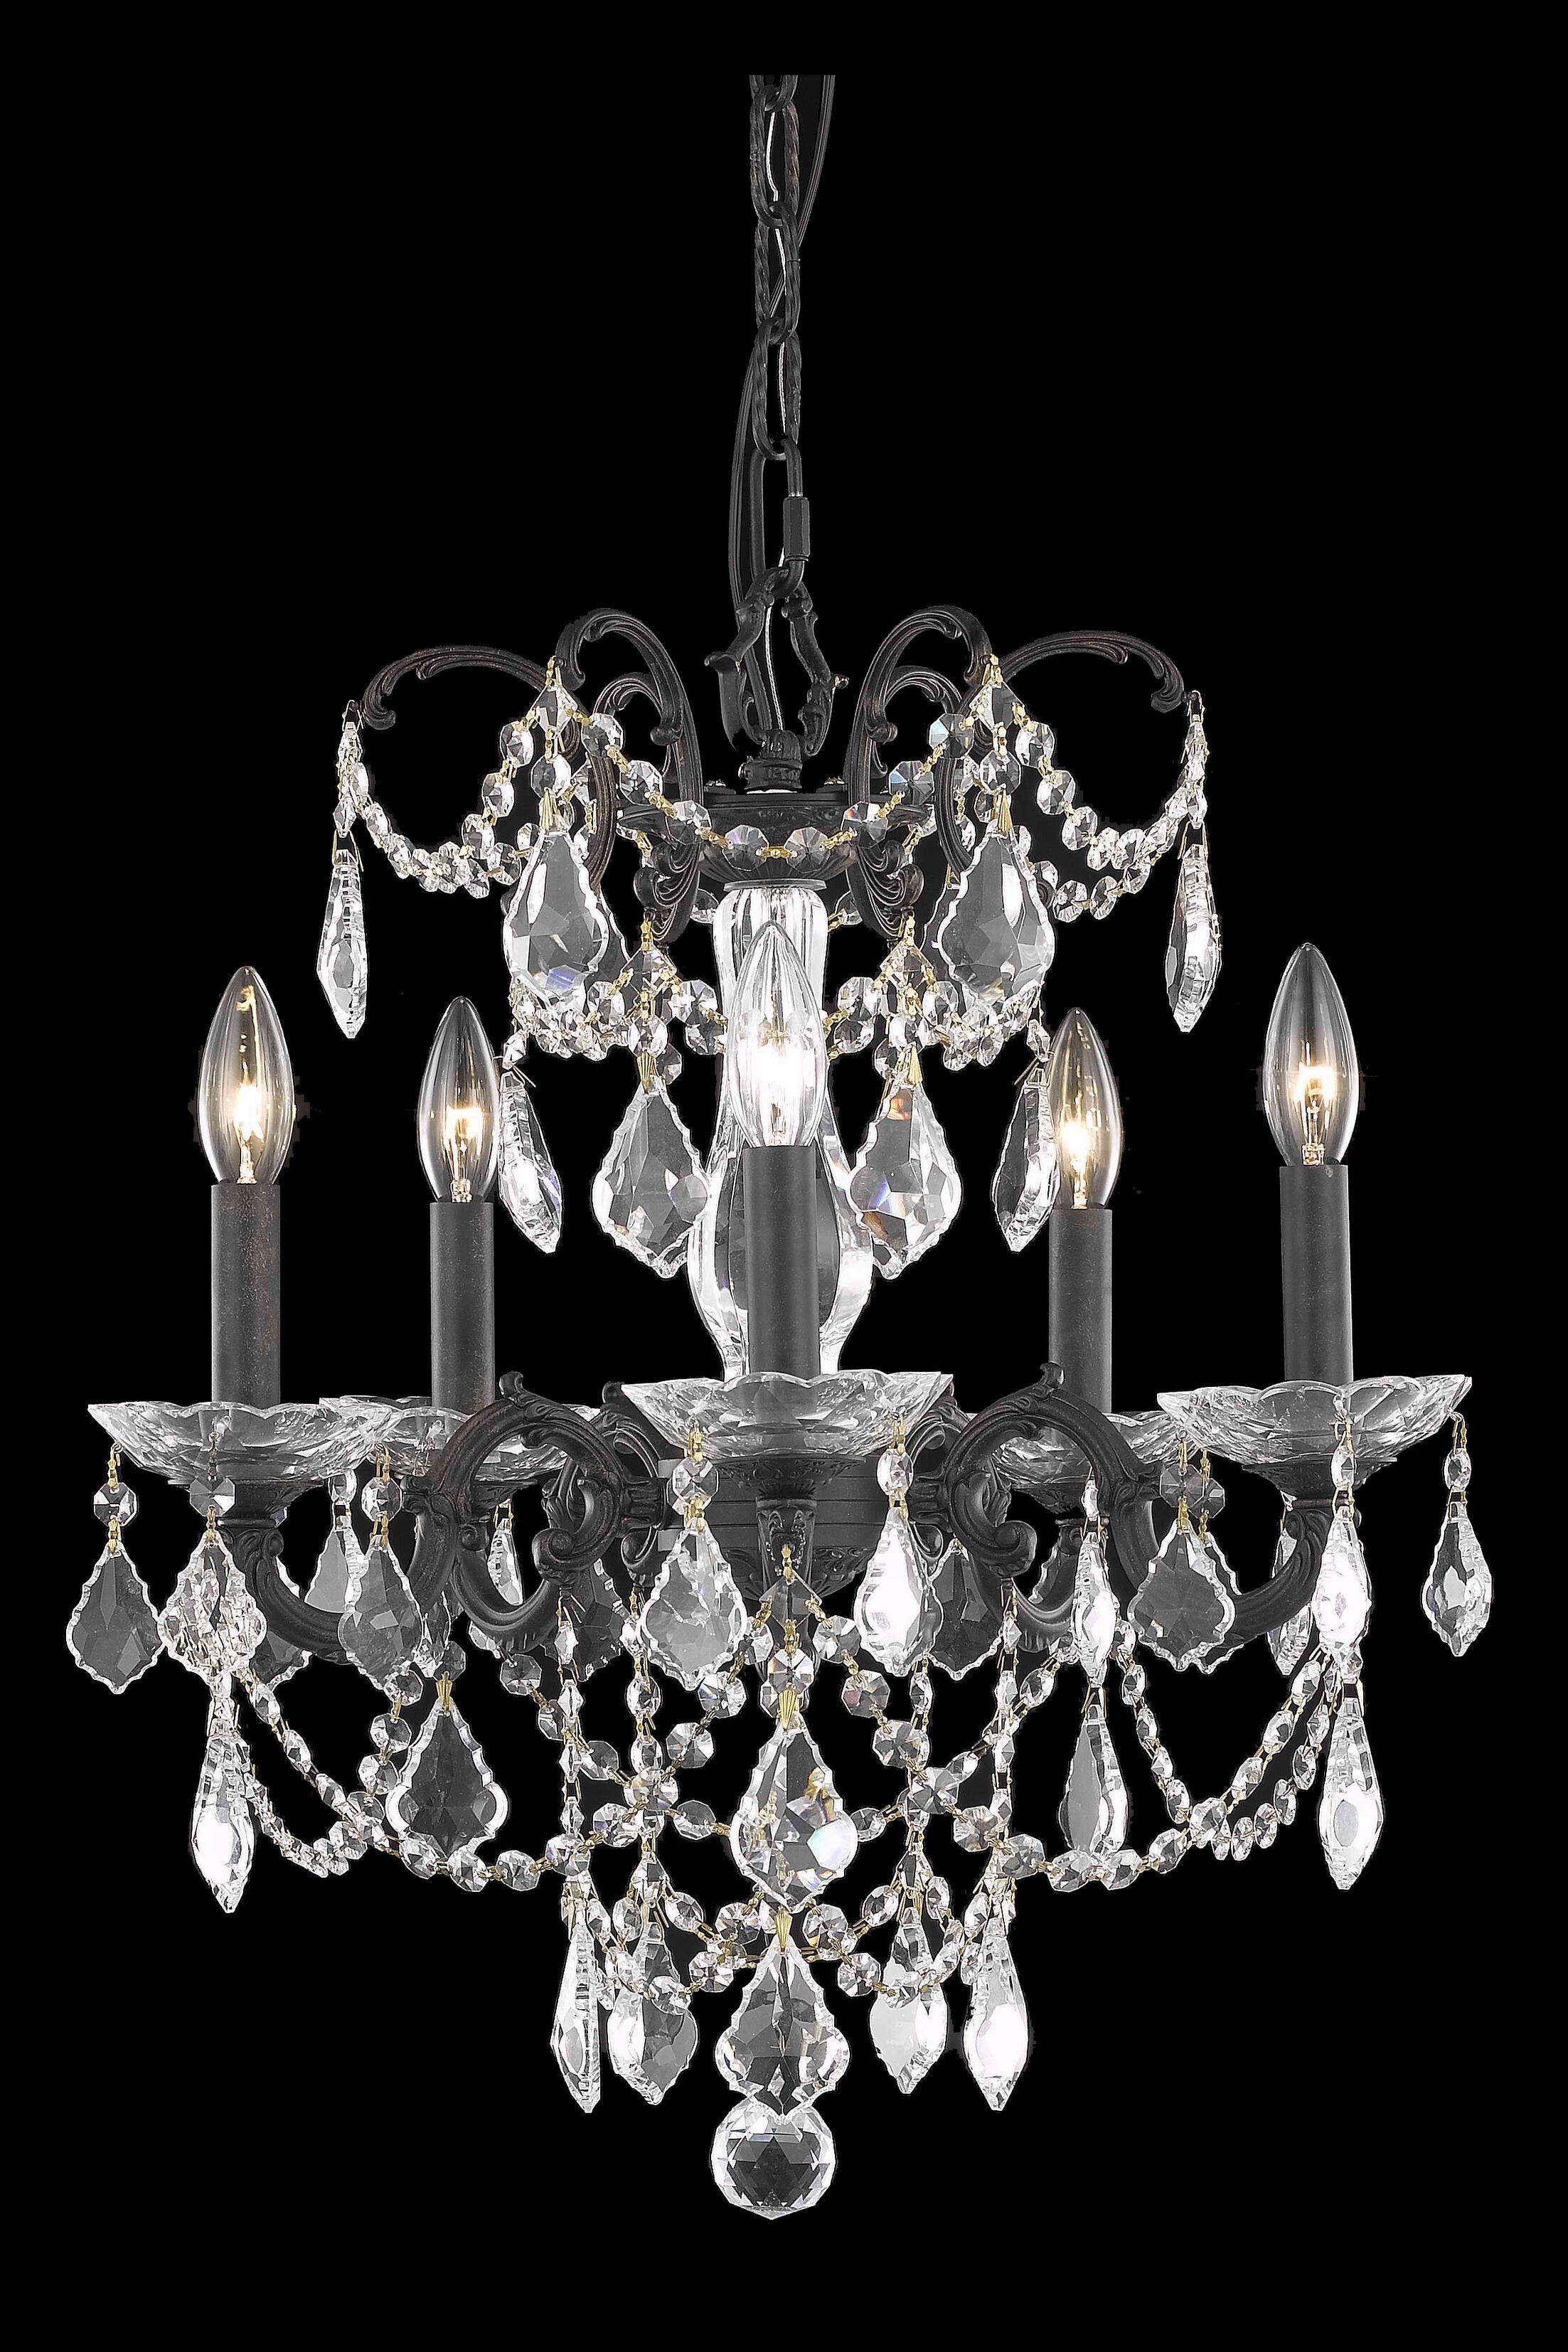 Cherie 5-Light Chandelier Crystal Grade: Elegant Cut, Finish: French Gold